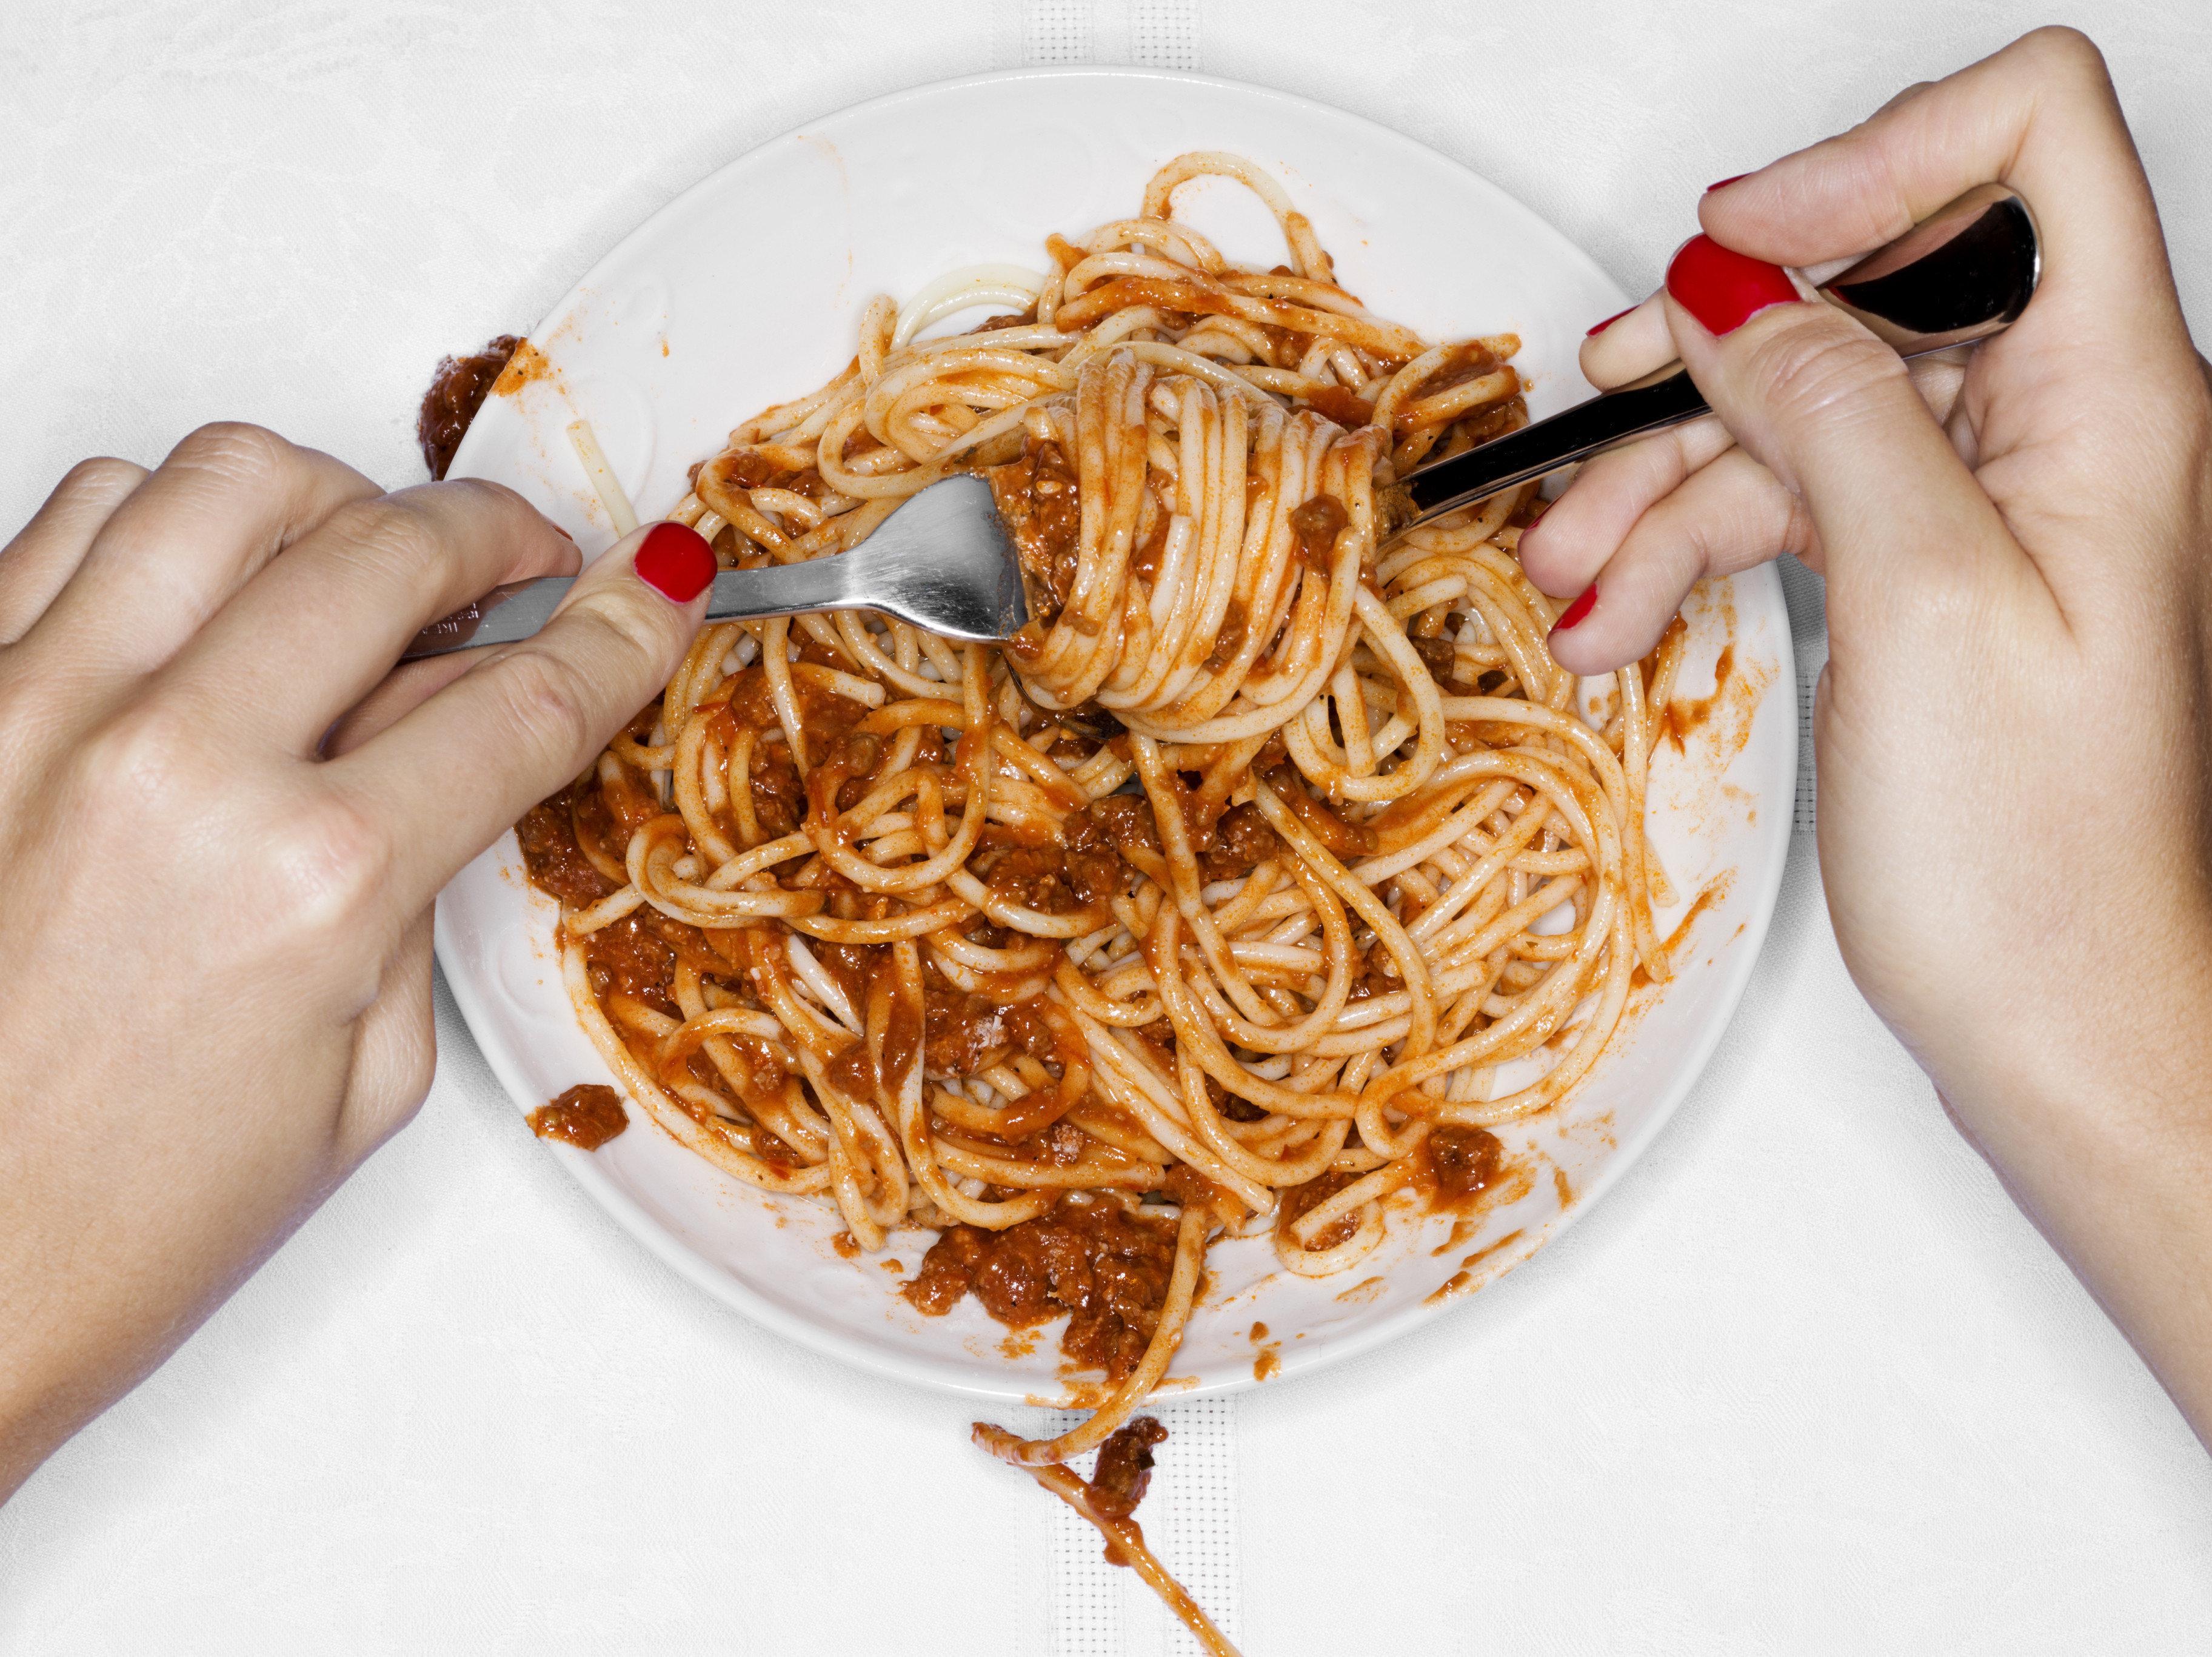 Female eating spaghetti, overhead view